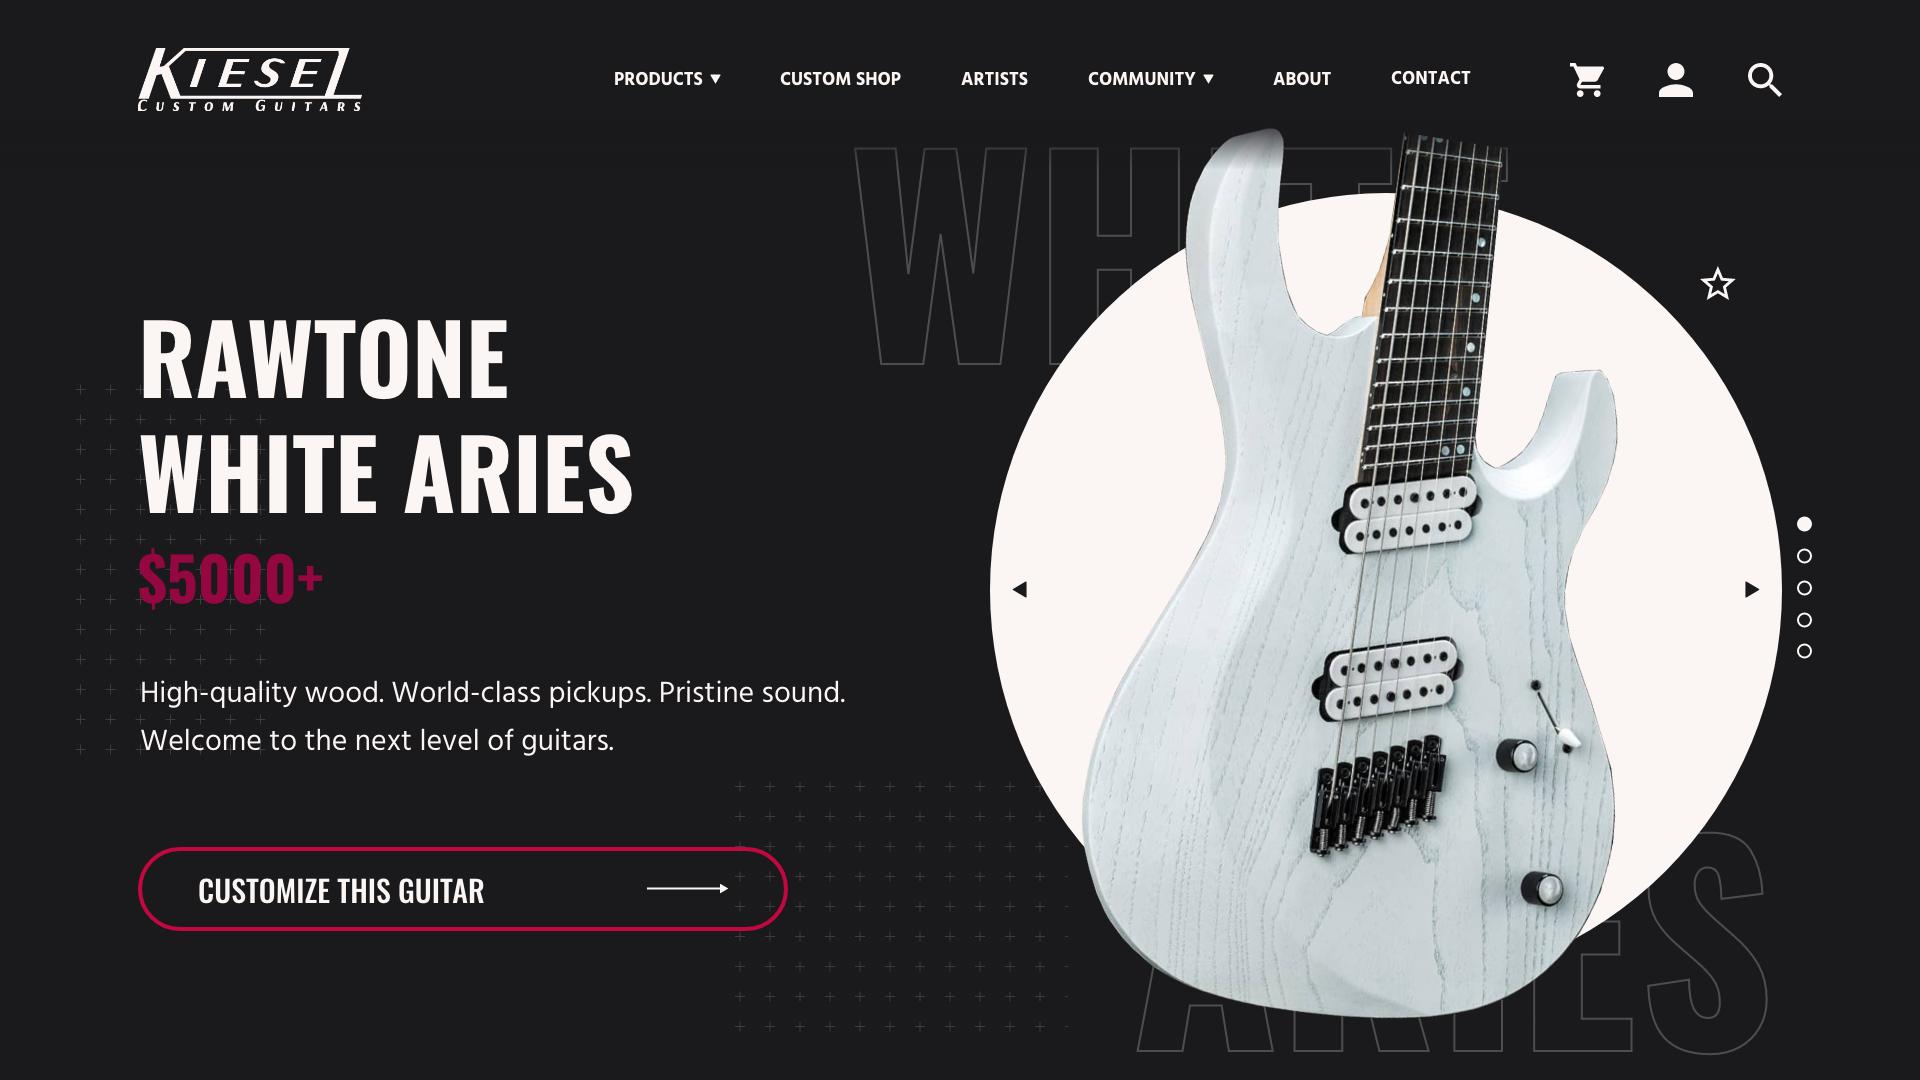 Kiesel Guitars Responsive Website Redesign Case Study